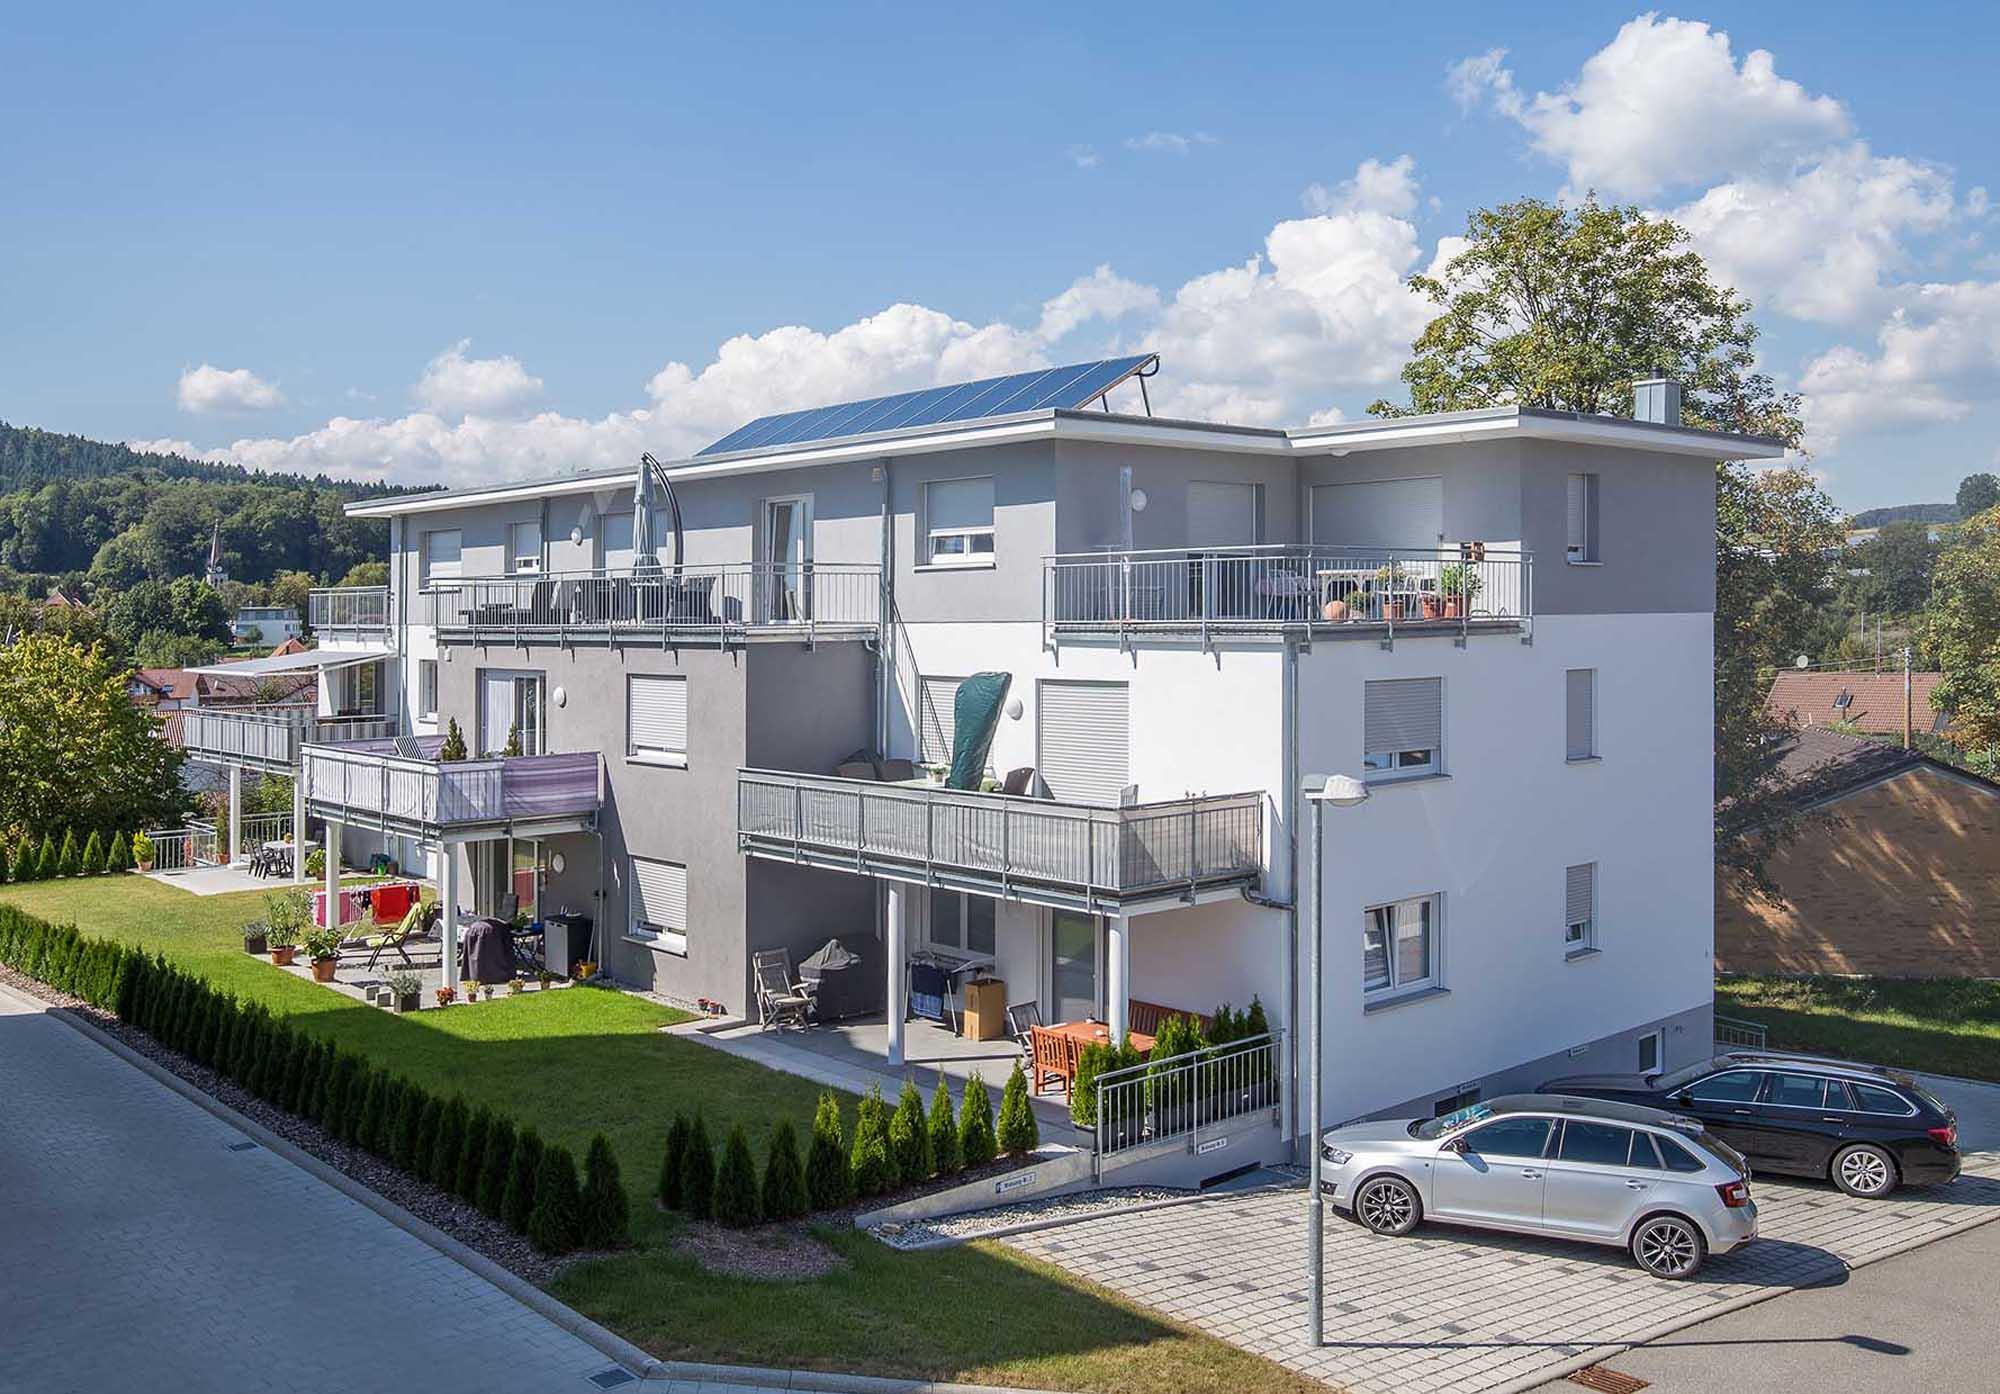 Stockach – Schlittenwiese 6-3